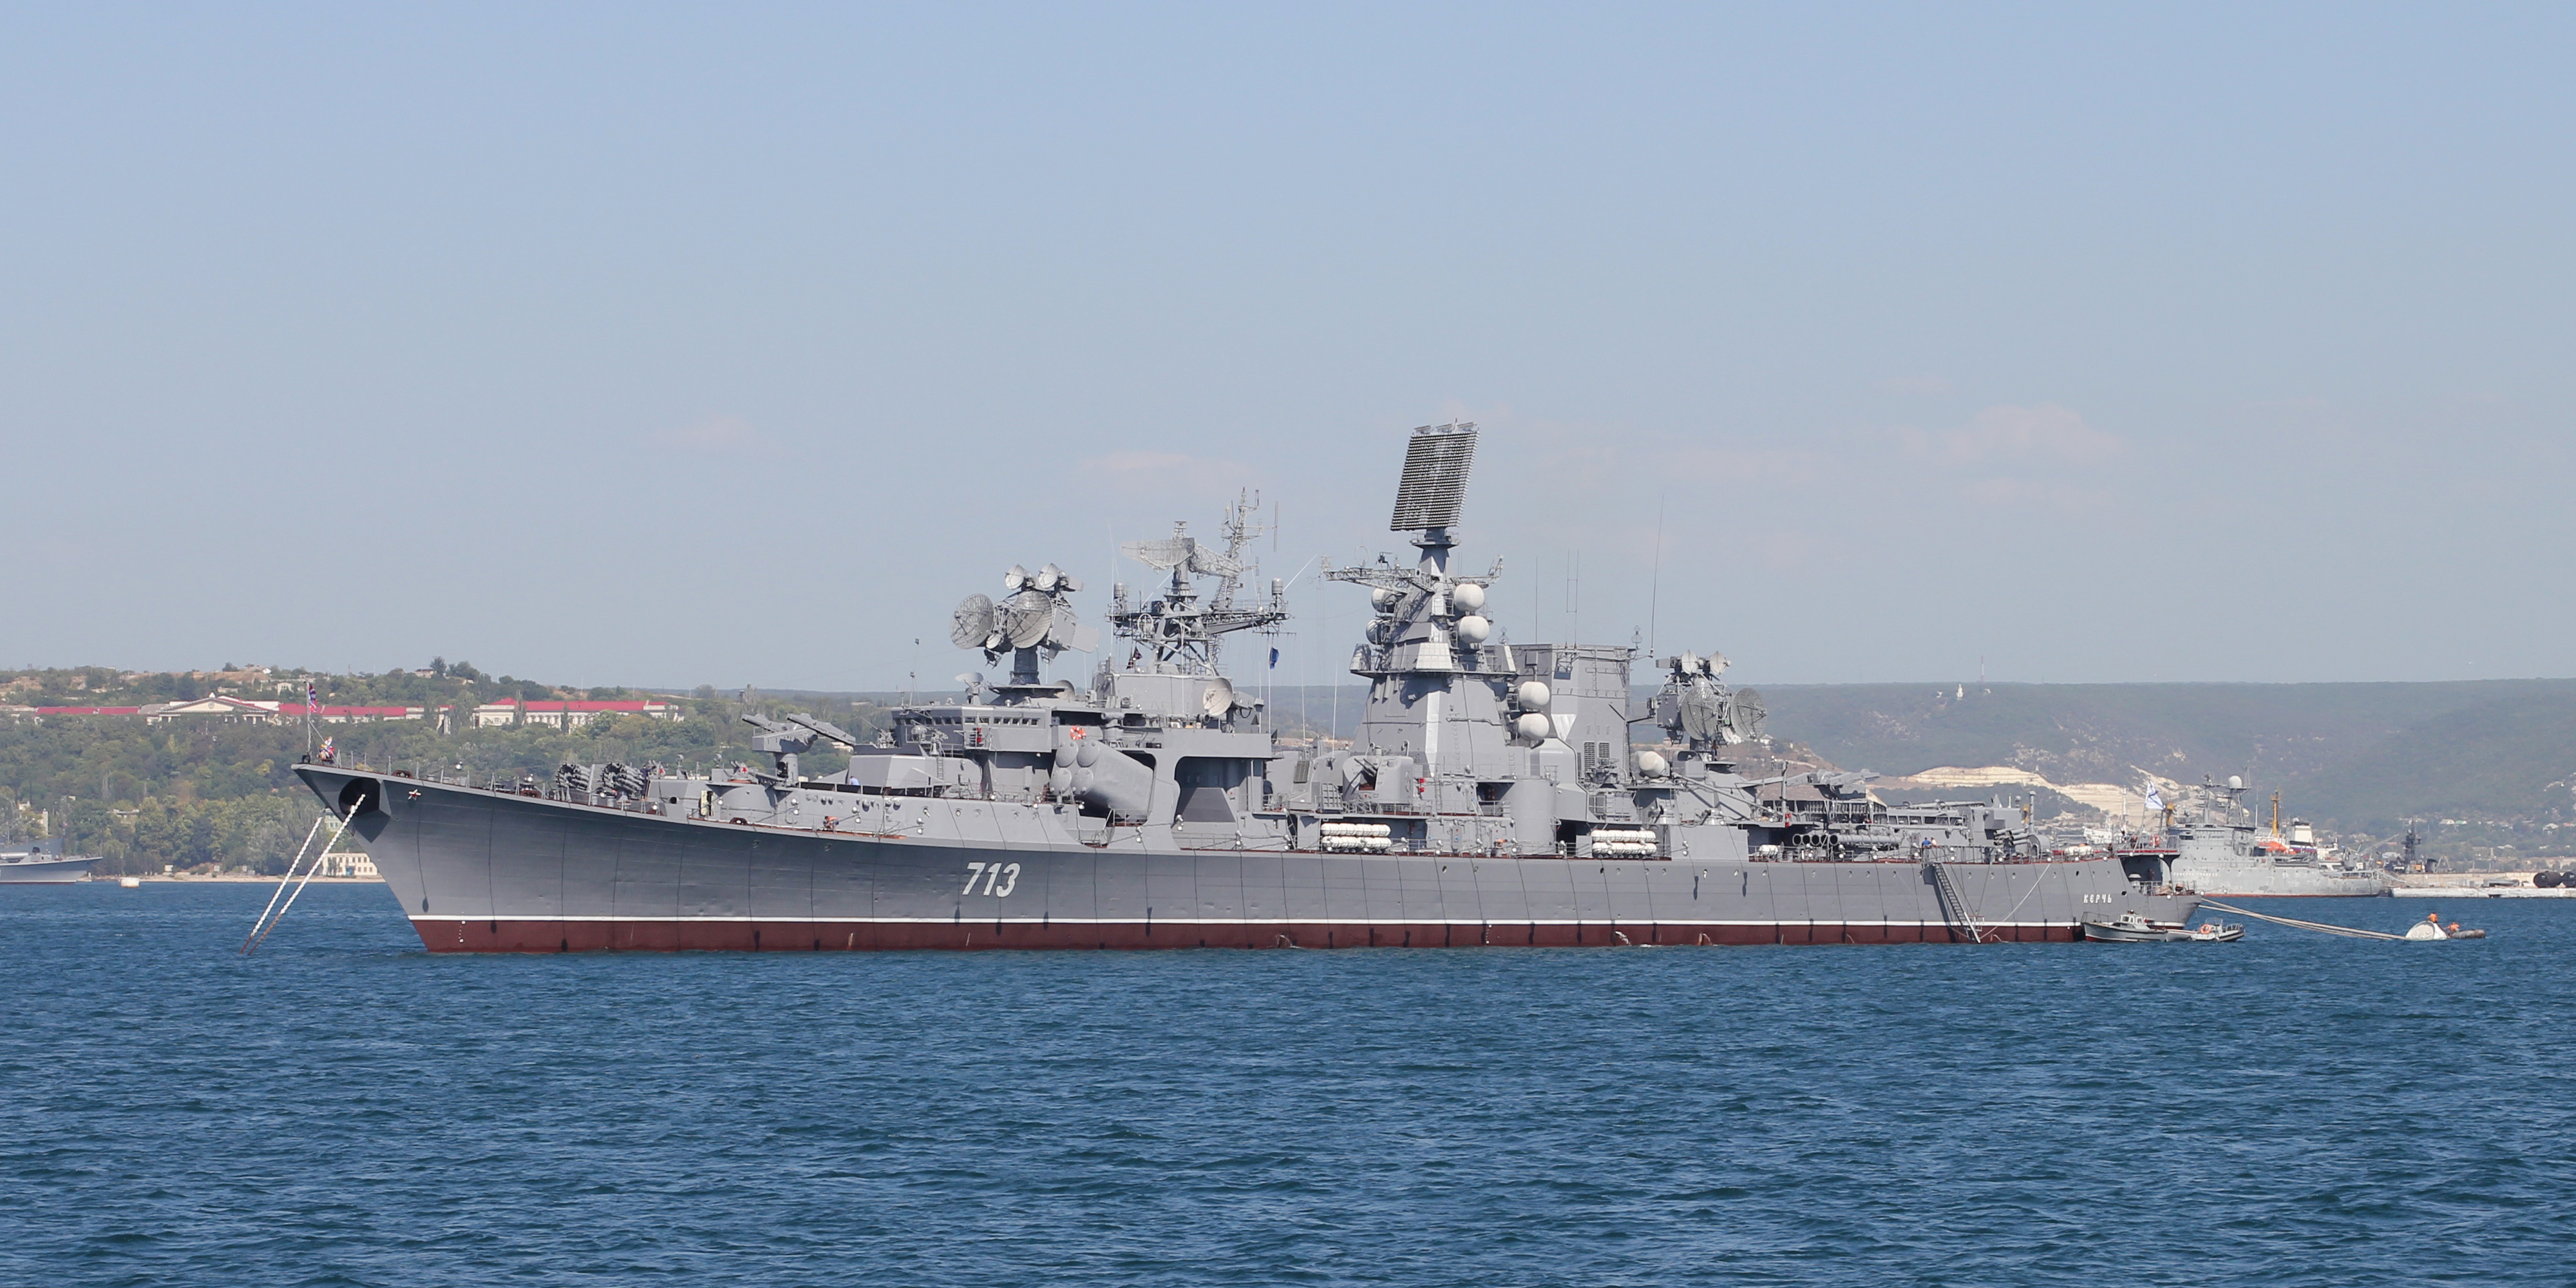 база северного флота